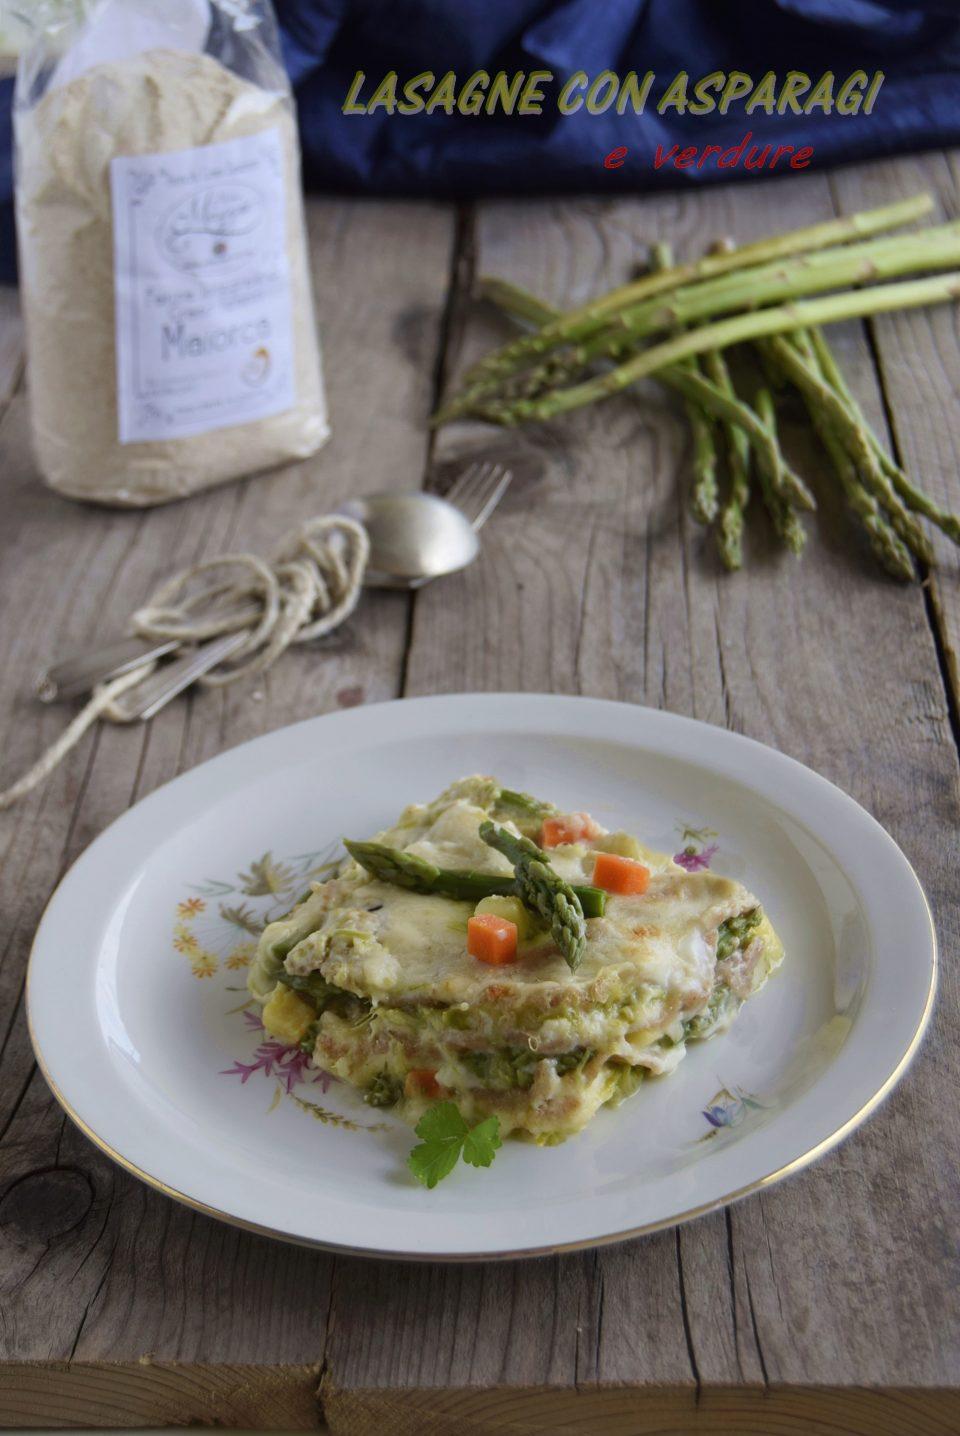 Lasagne con asparagi e verdure